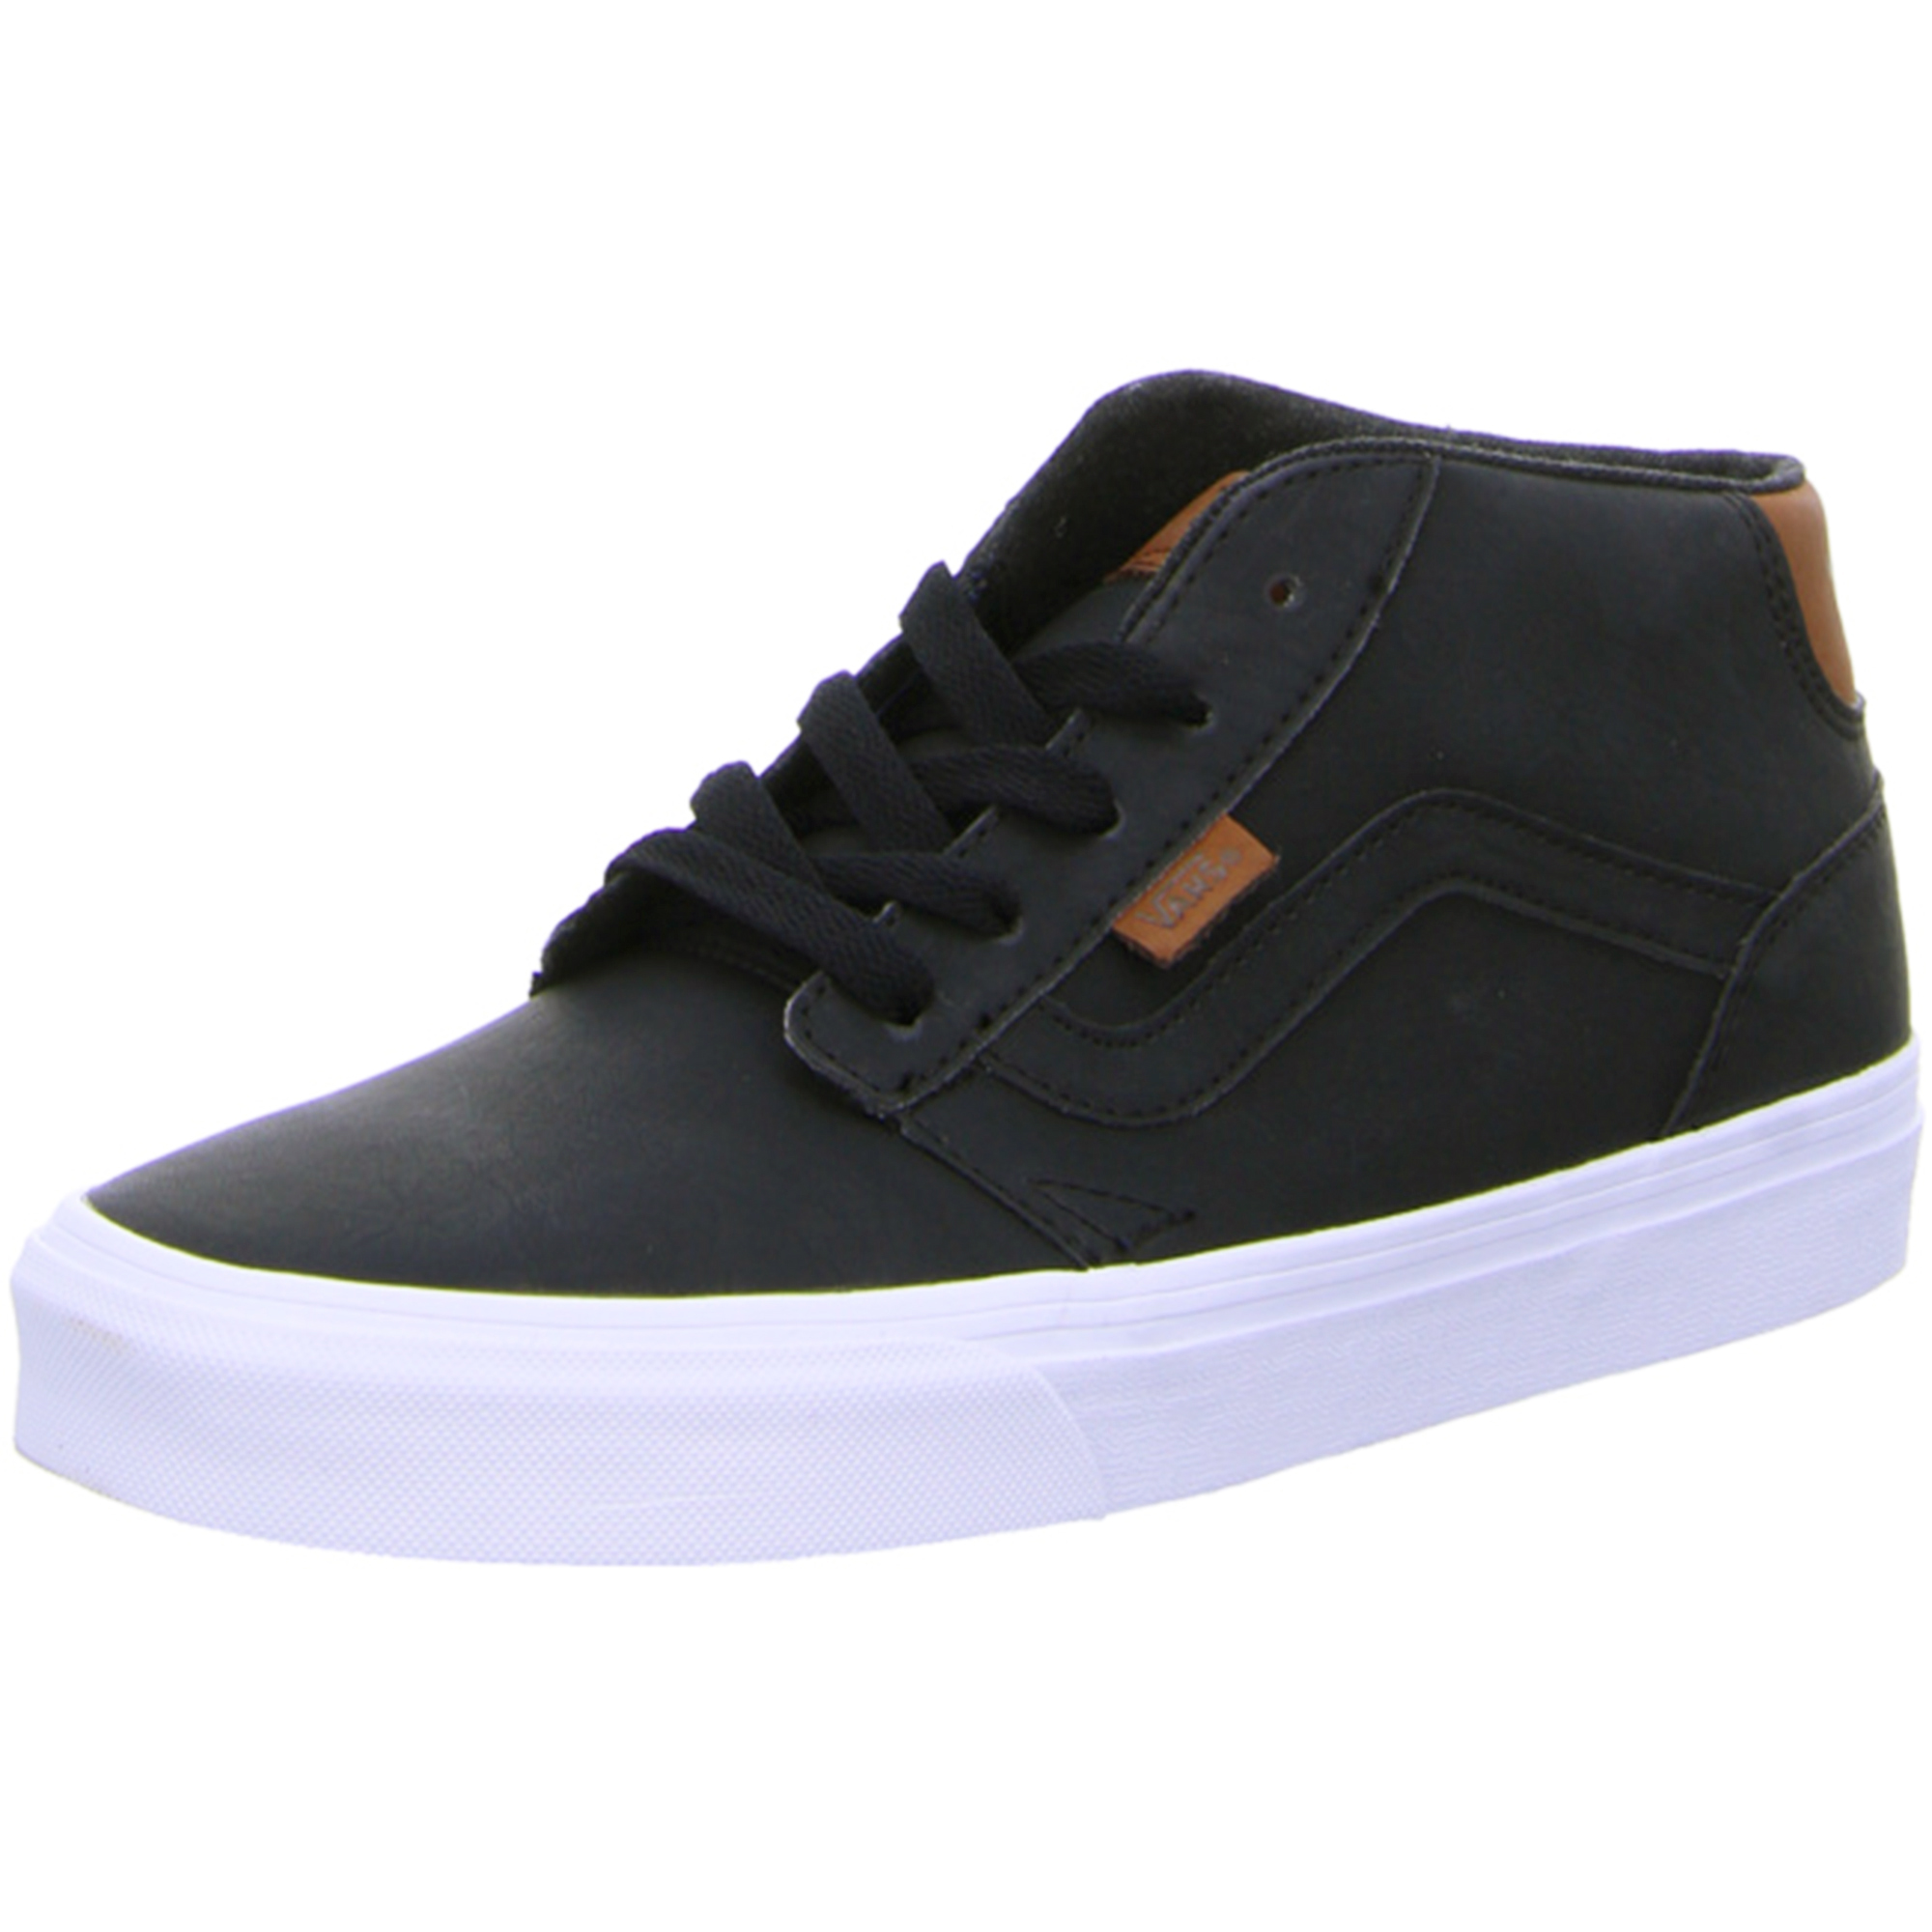 Vans Chapman Mid Low Mens Skate Shoes